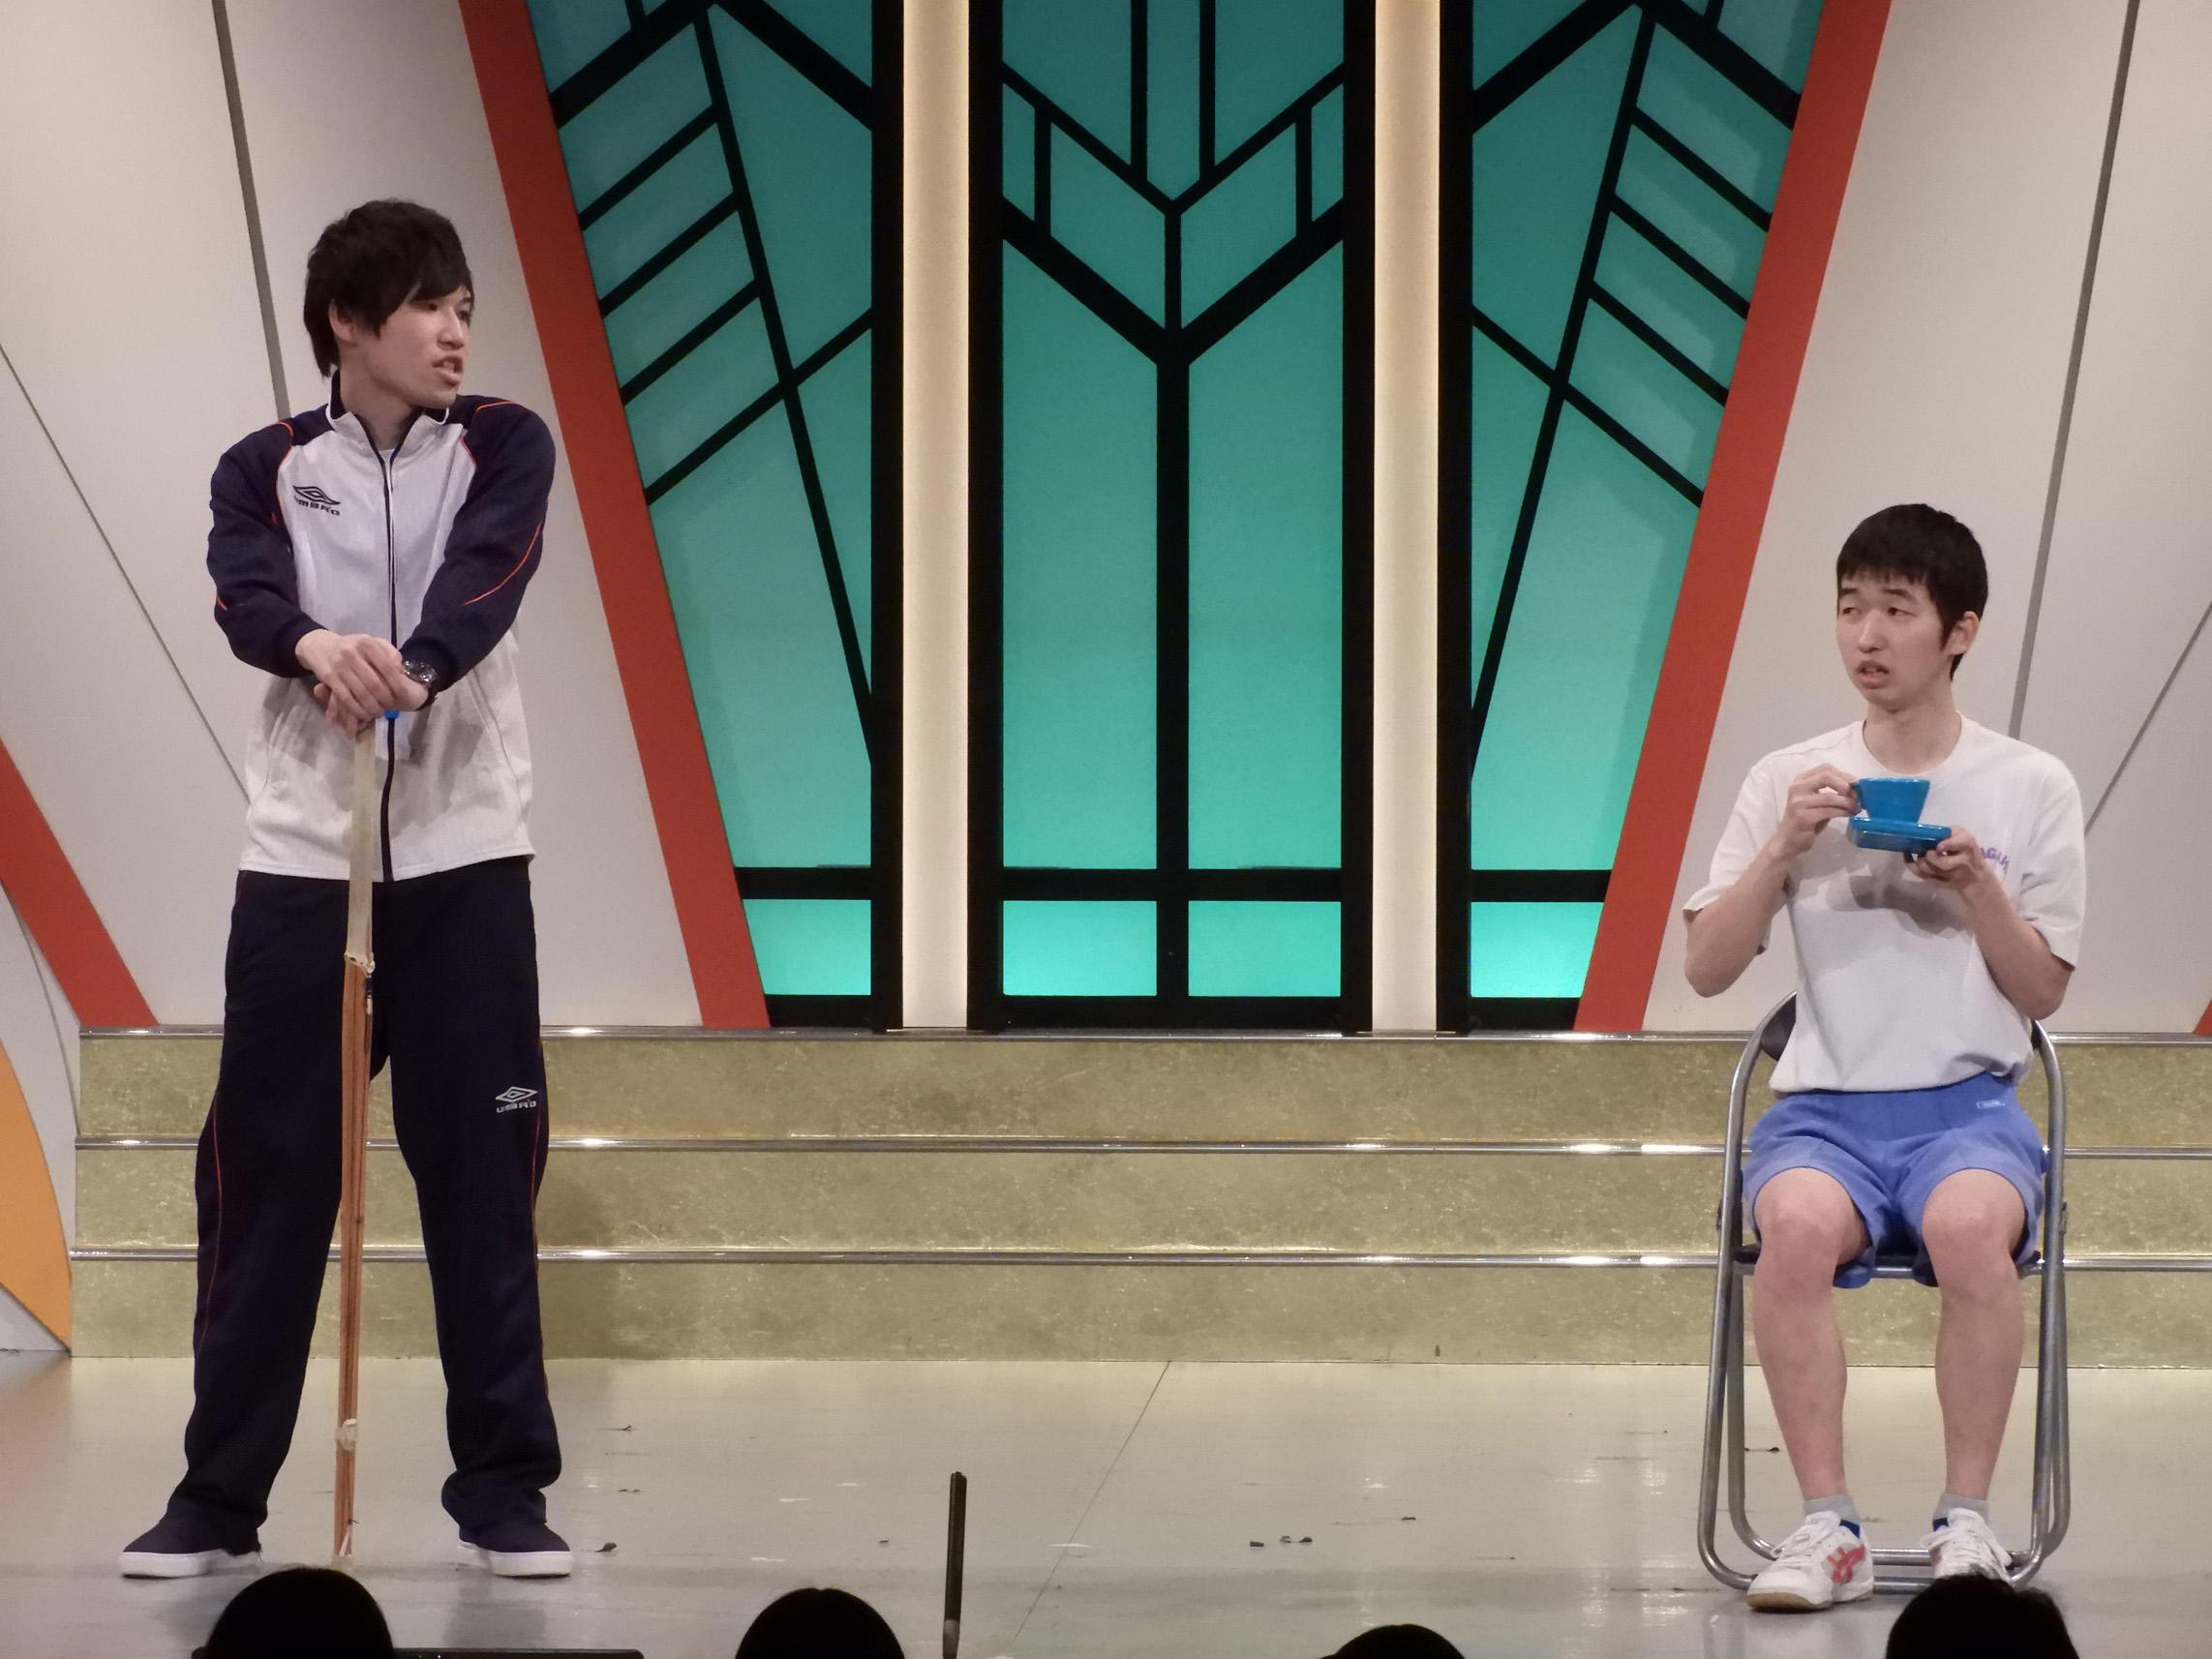 http://news.yoshimoto.co.jp/20180511110503-0a4926fc1599f7796f19a04589ed9884f96d4ca1.jpg